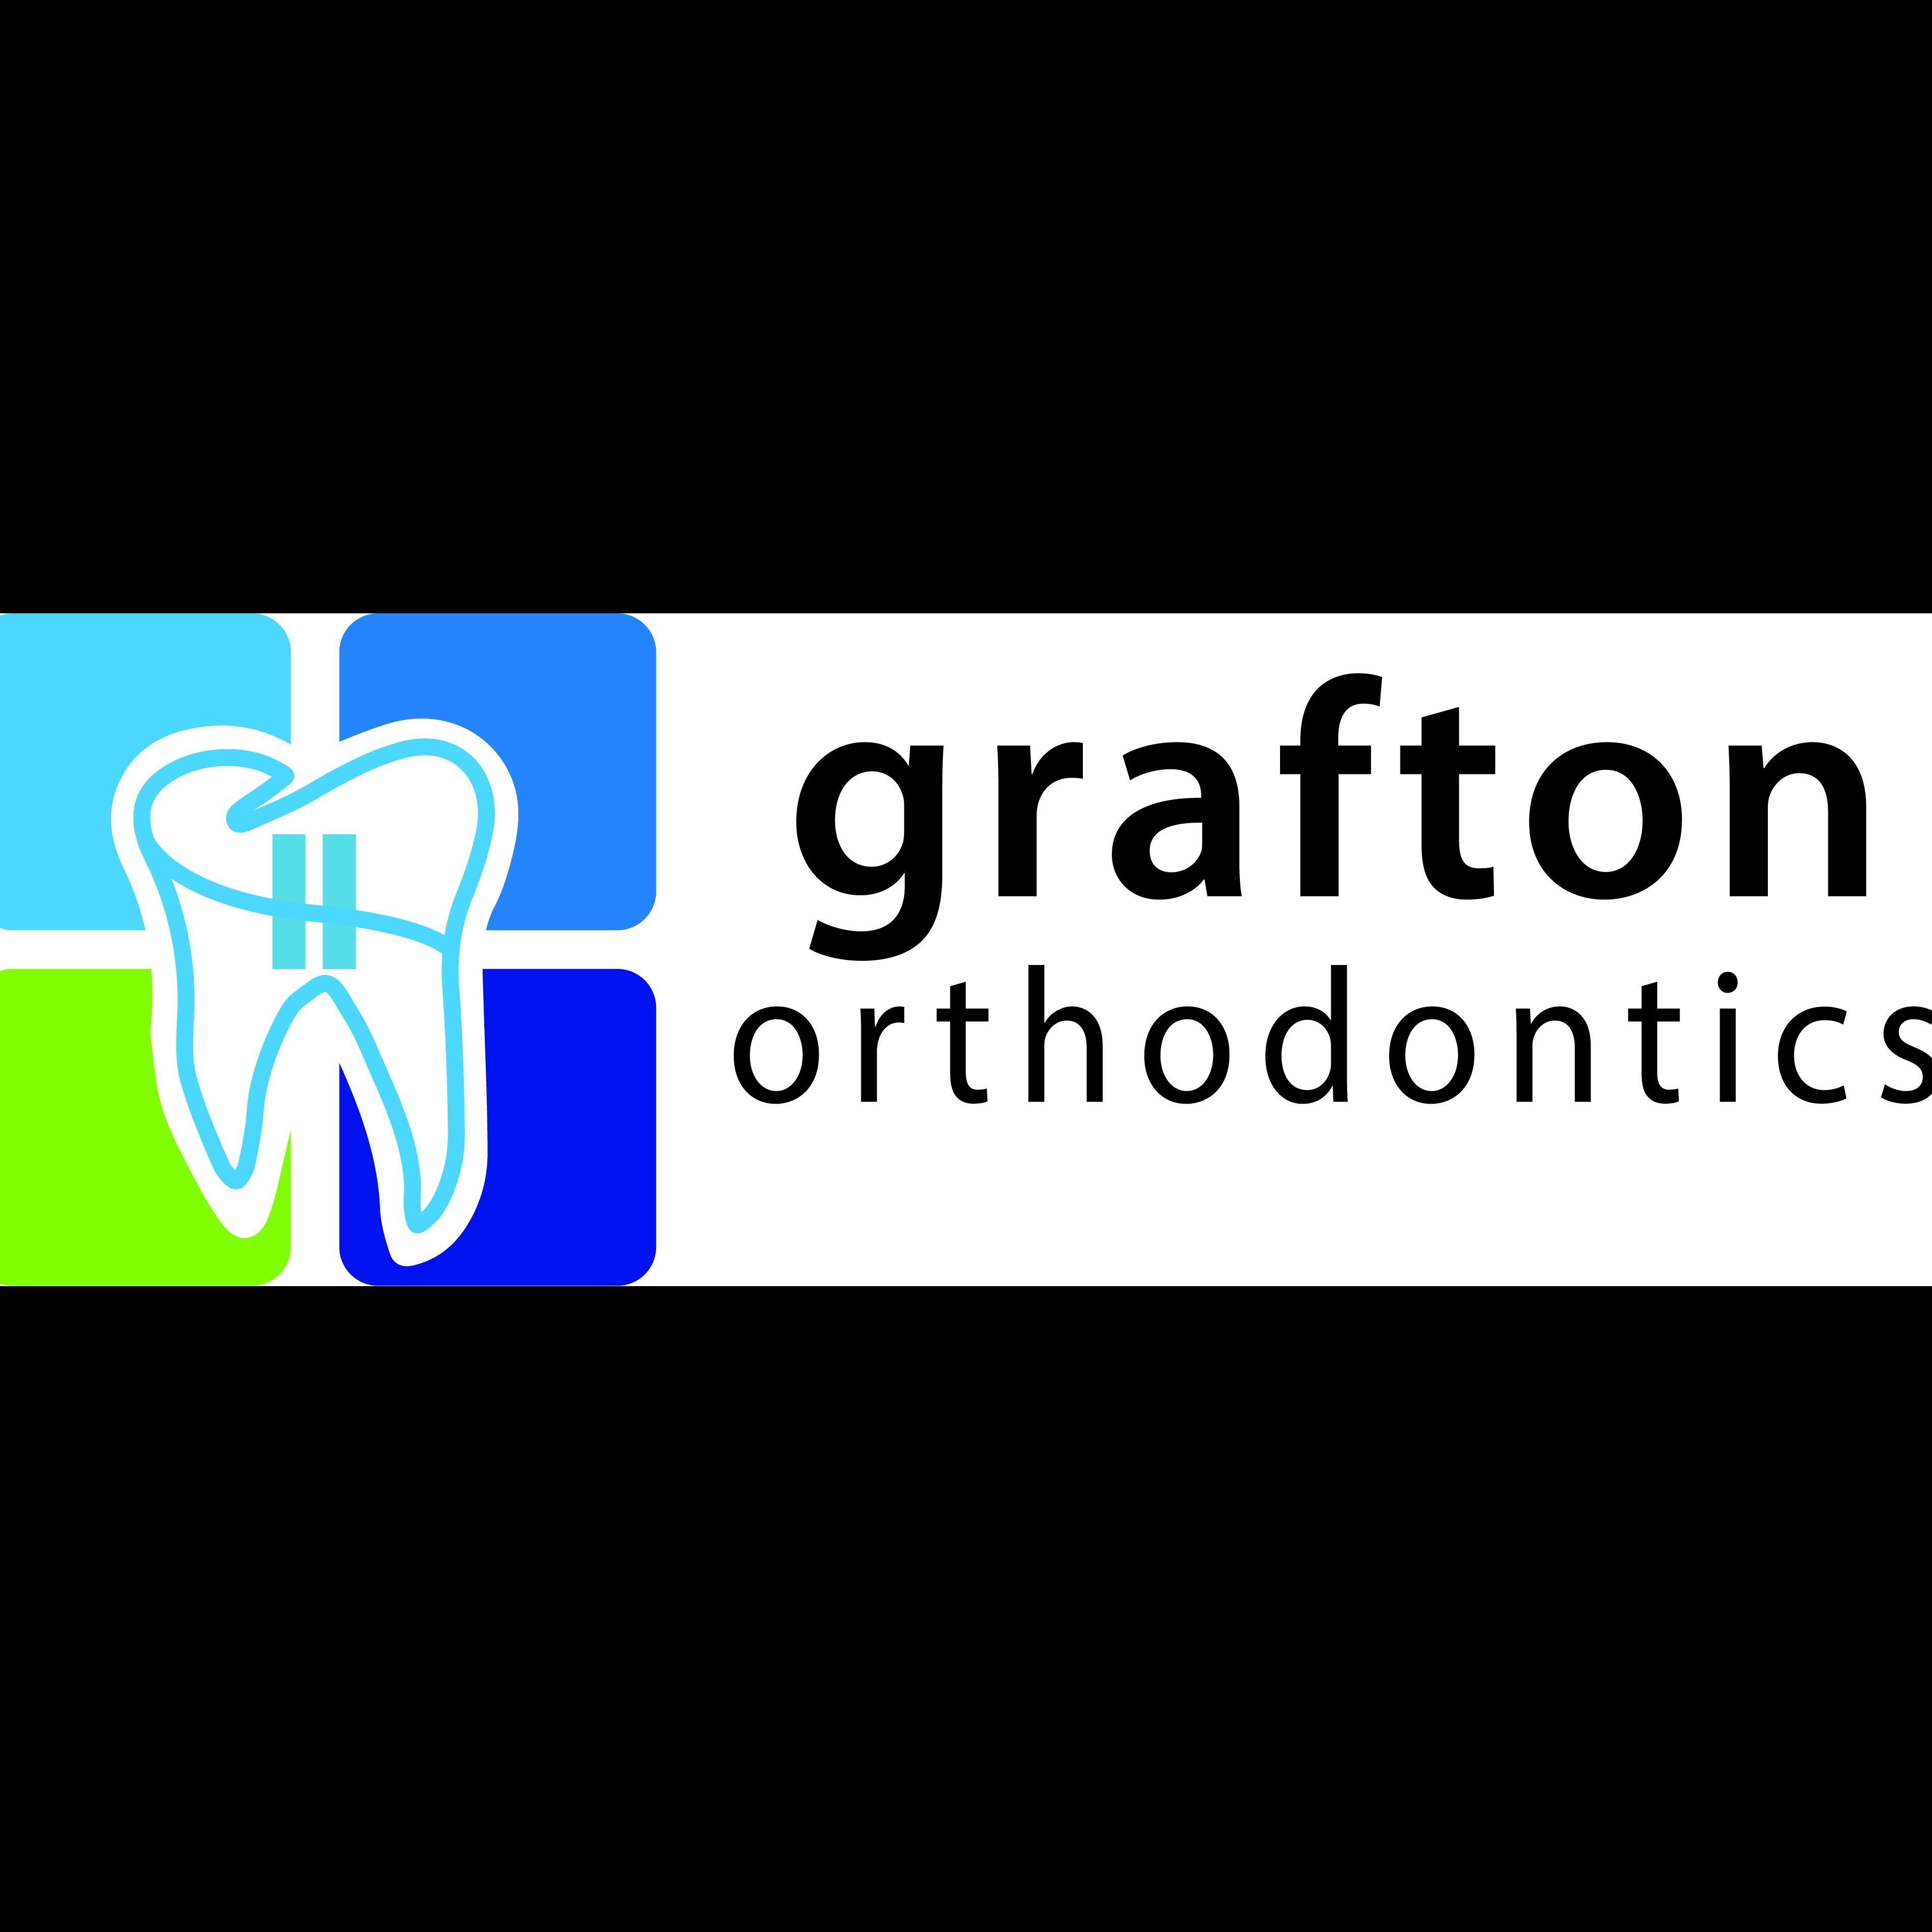 Grafton Orthodontics